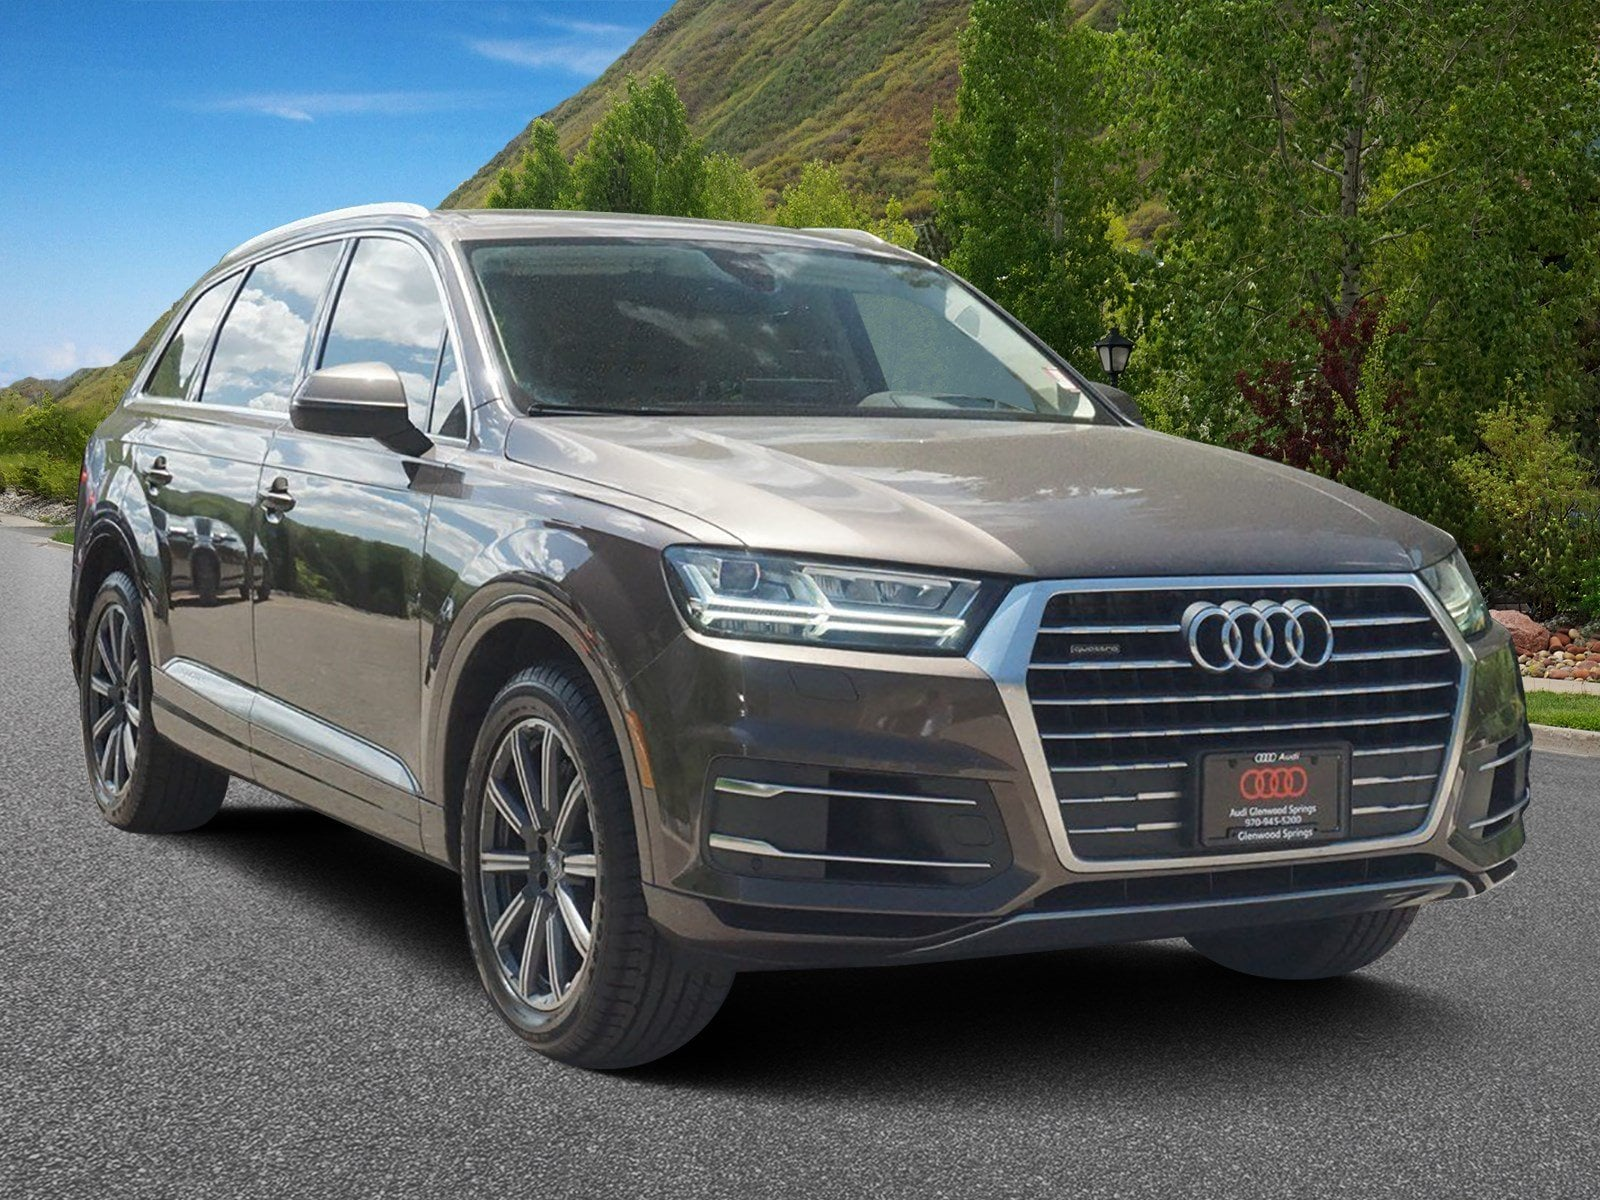 2017 Audi Q7 3.0 TFSI Prestige